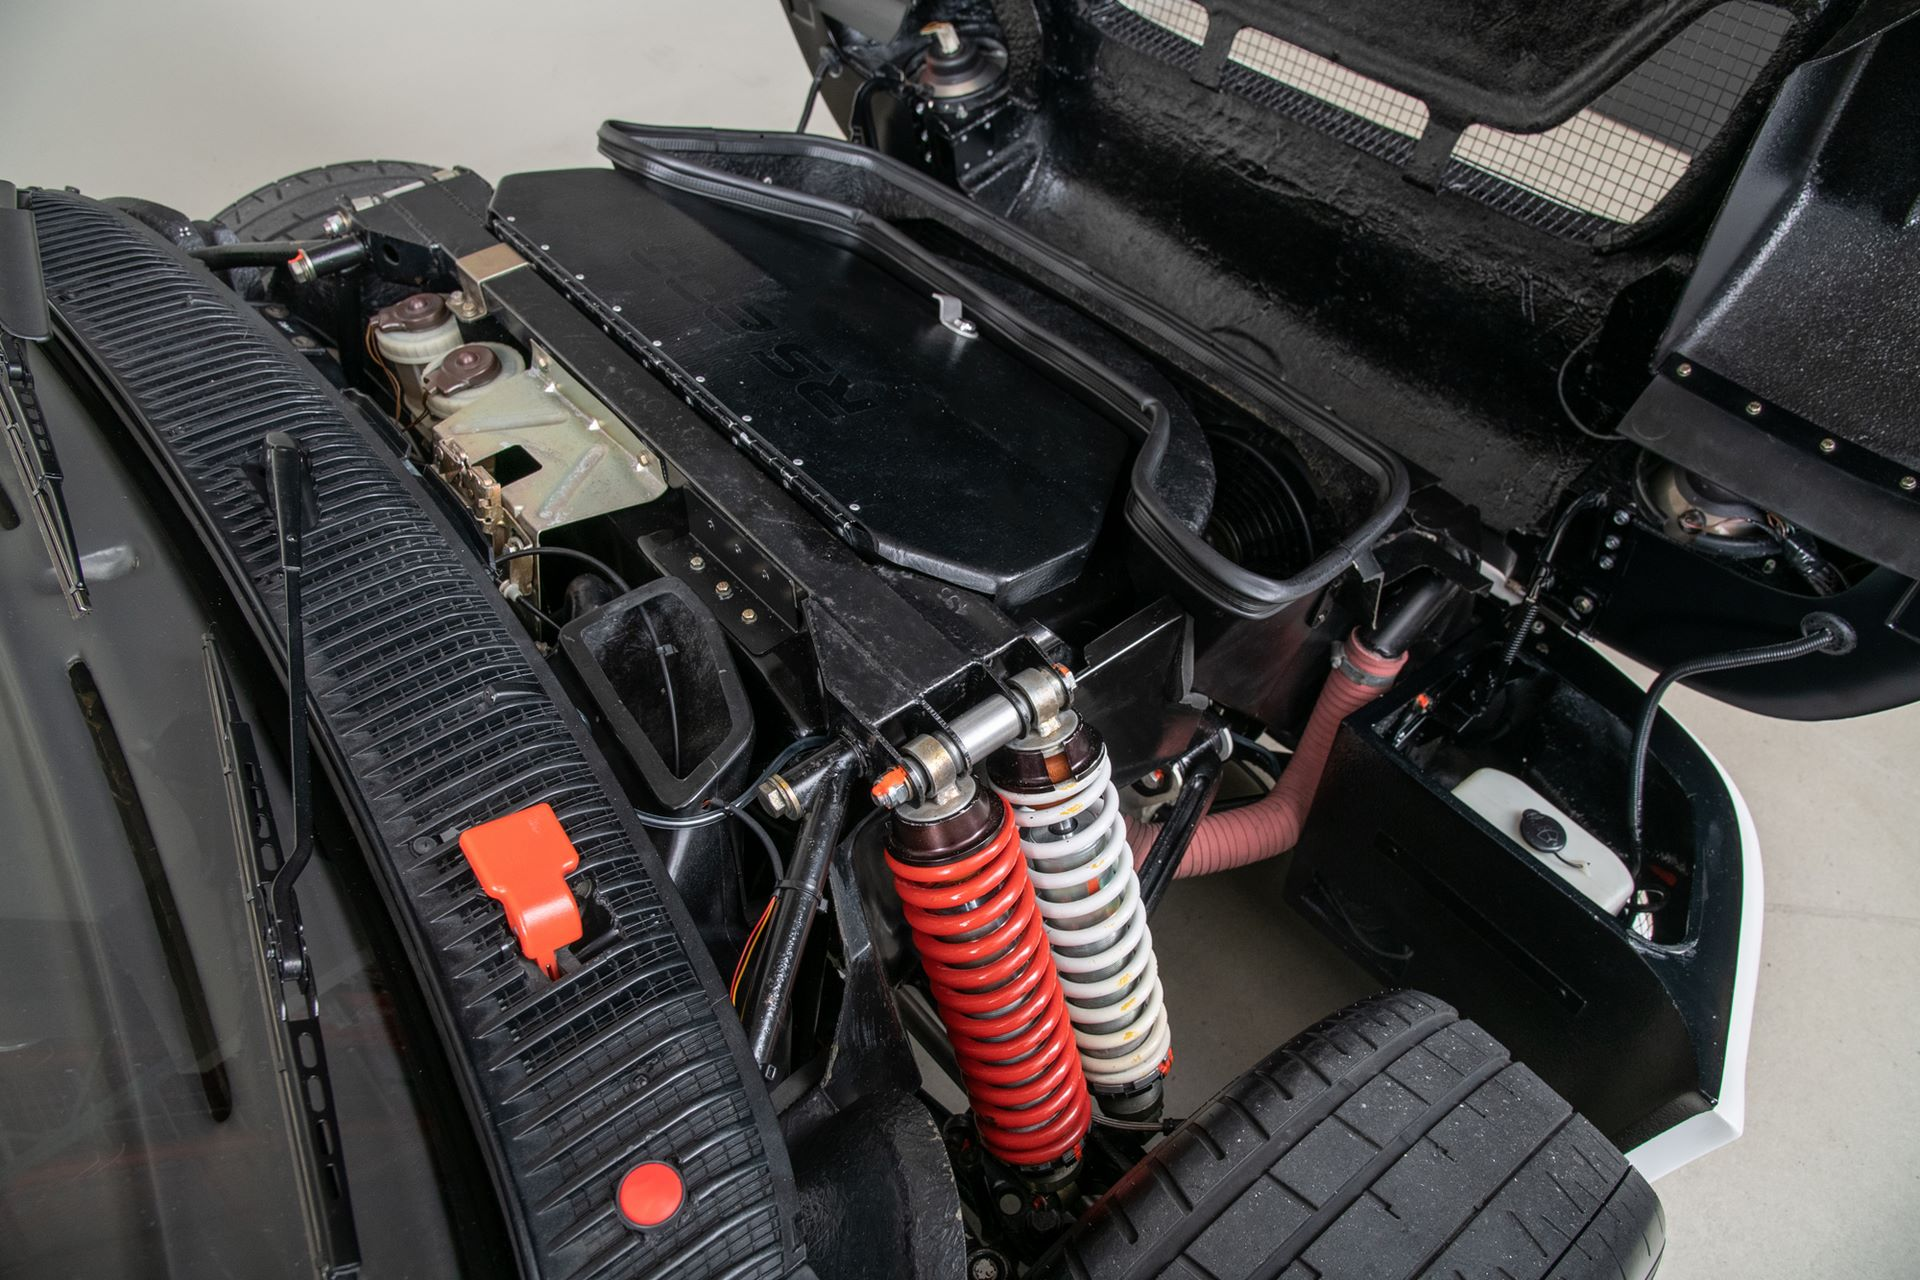 Ford-RS200-Evolution-Evo-for-sale-36